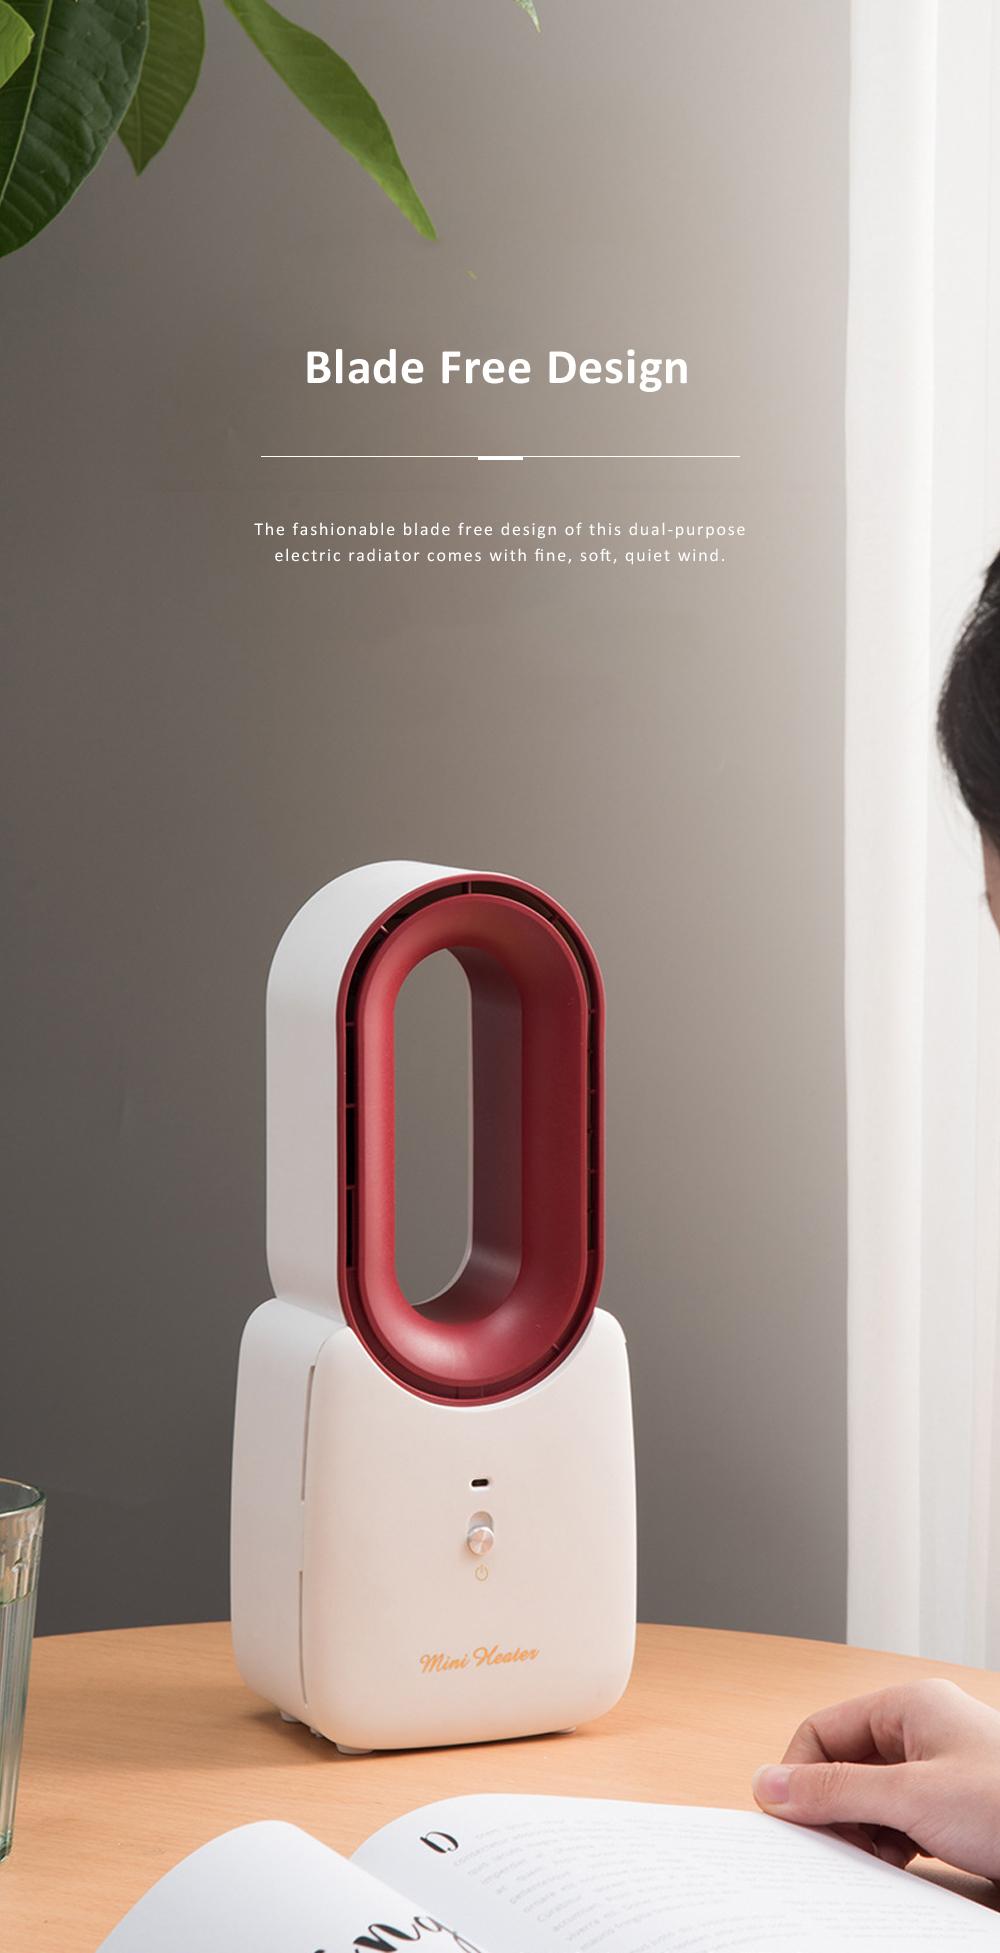 Home Office Desktop Heater for Energy-saving Mini Warmer Blade Free Dual-purpose Electric Radiator 3